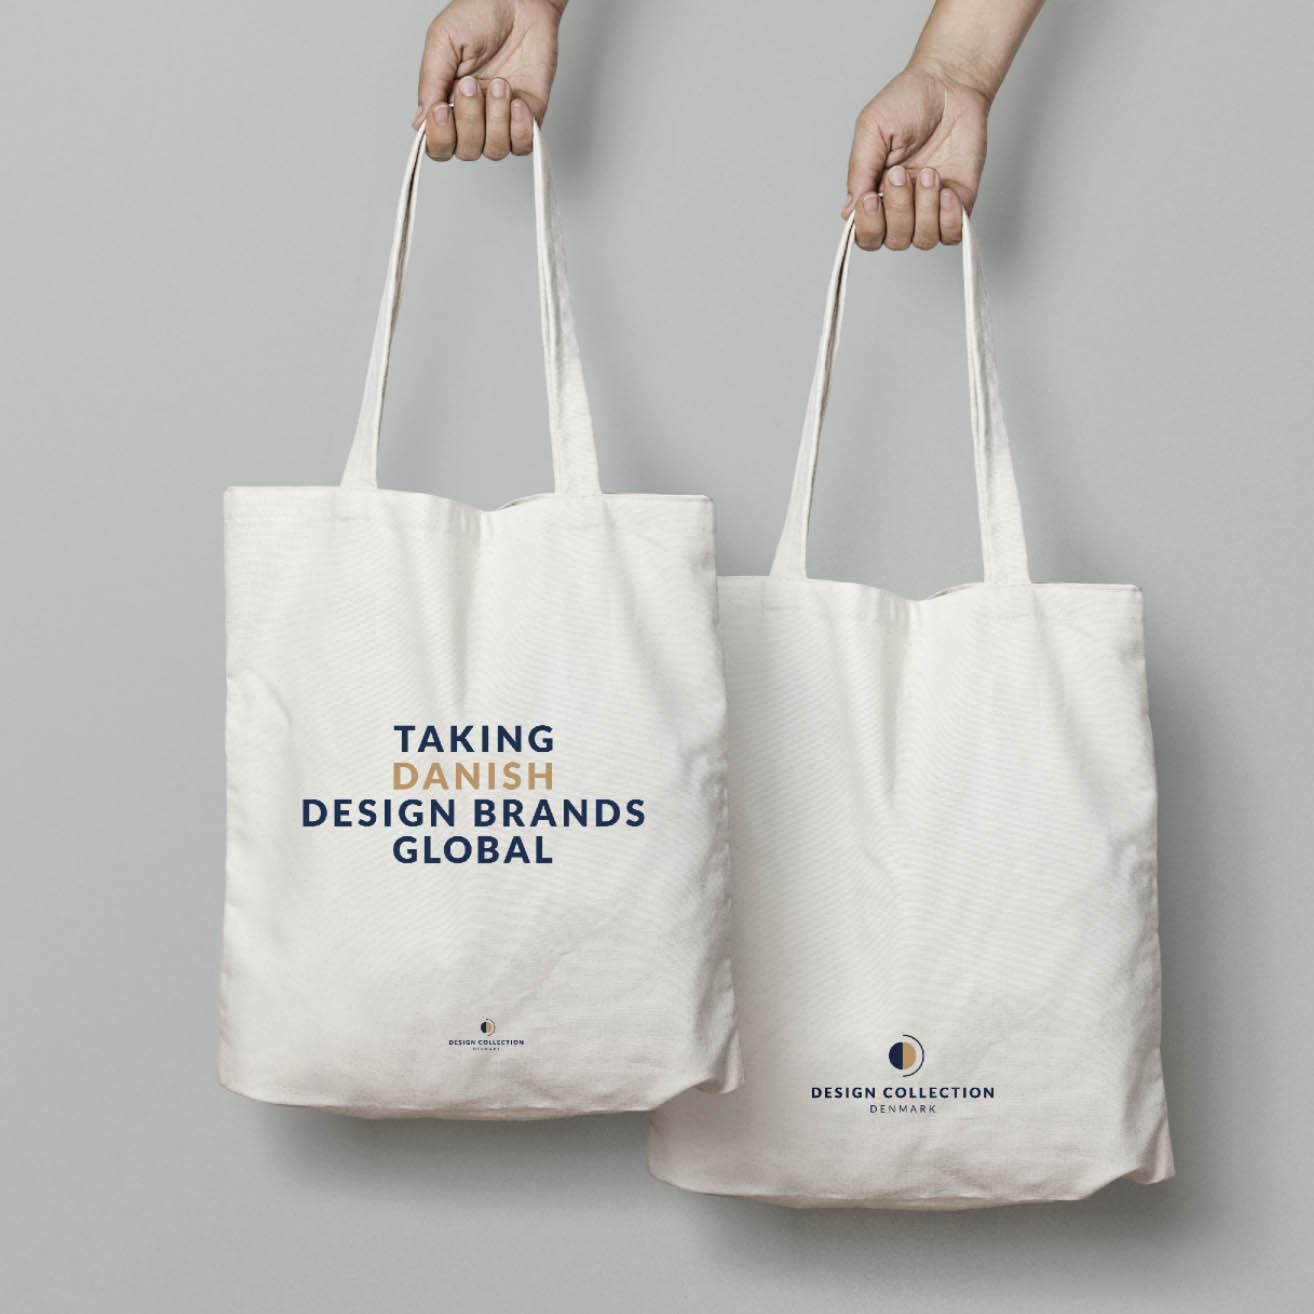 Design Collection Denmark totebag Ja-da